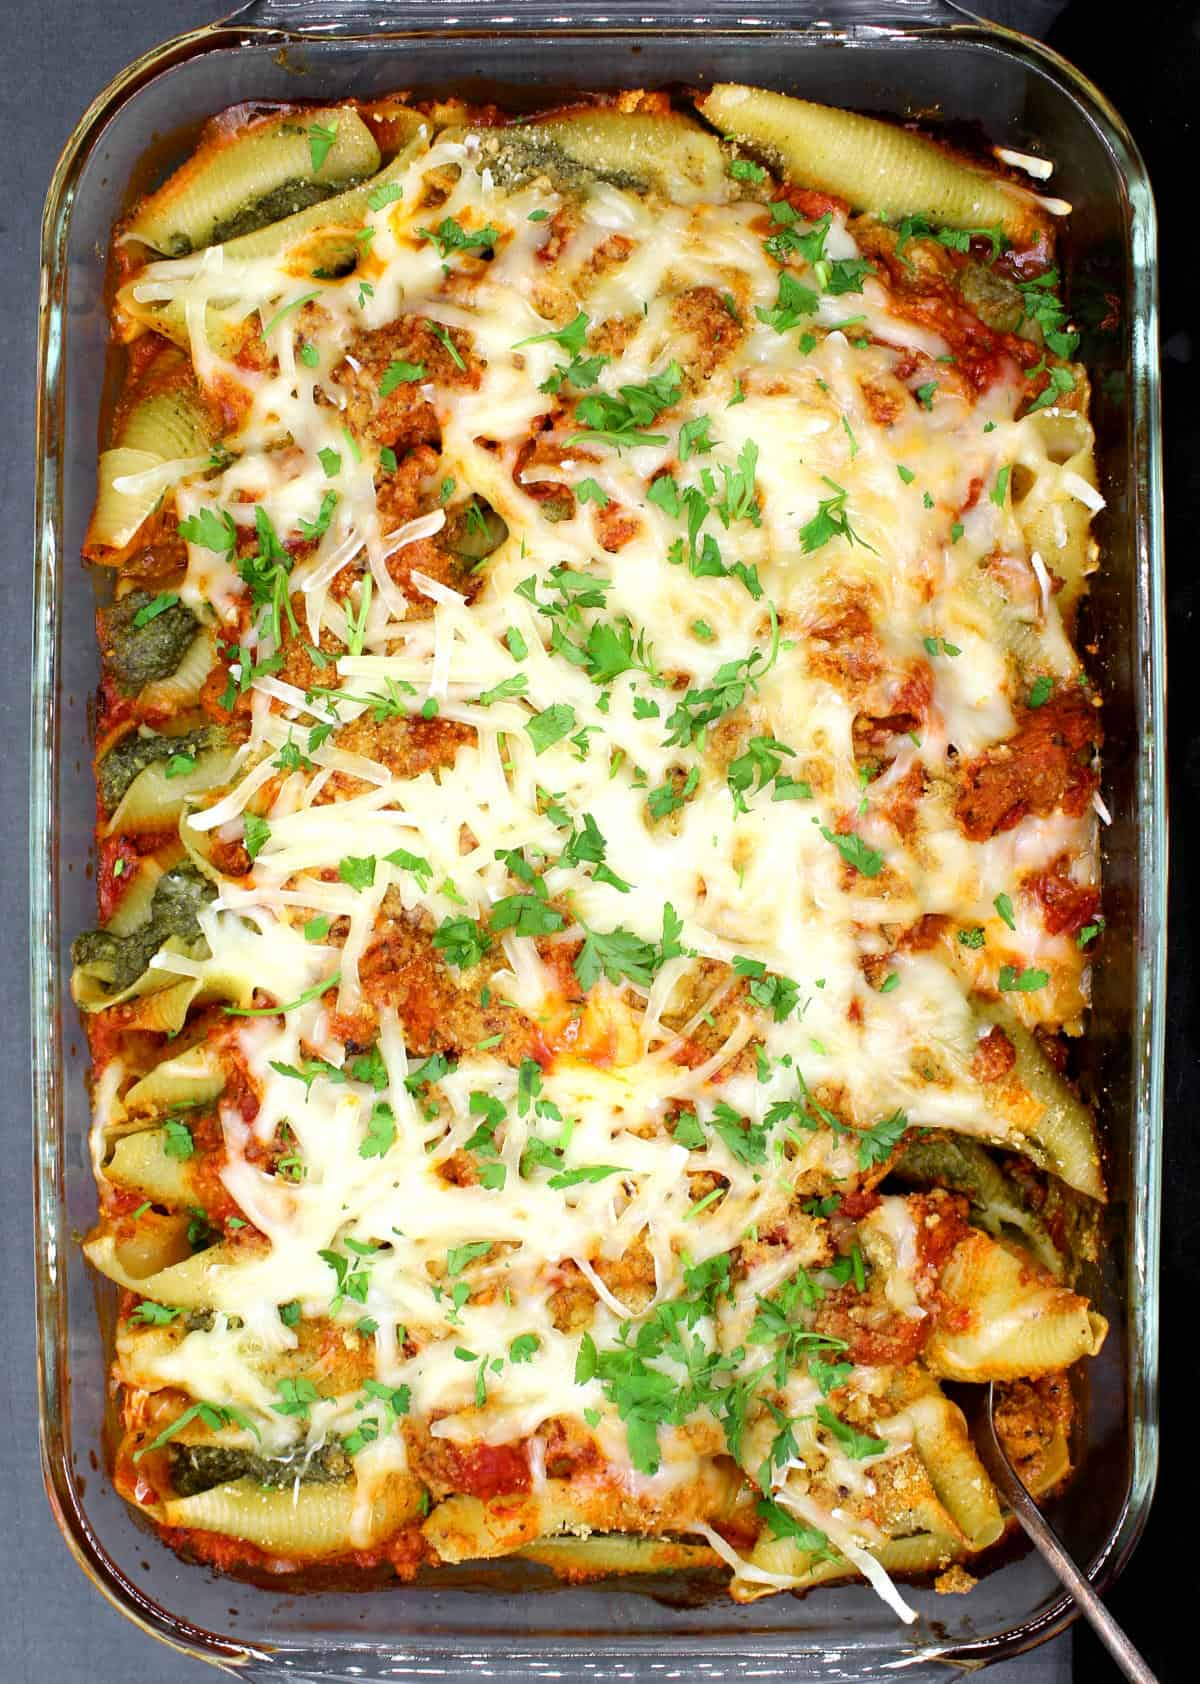 A closeup of a casserole with cheesy vegan stuffed shells with meaty marinara sauce and mozarella shreds.